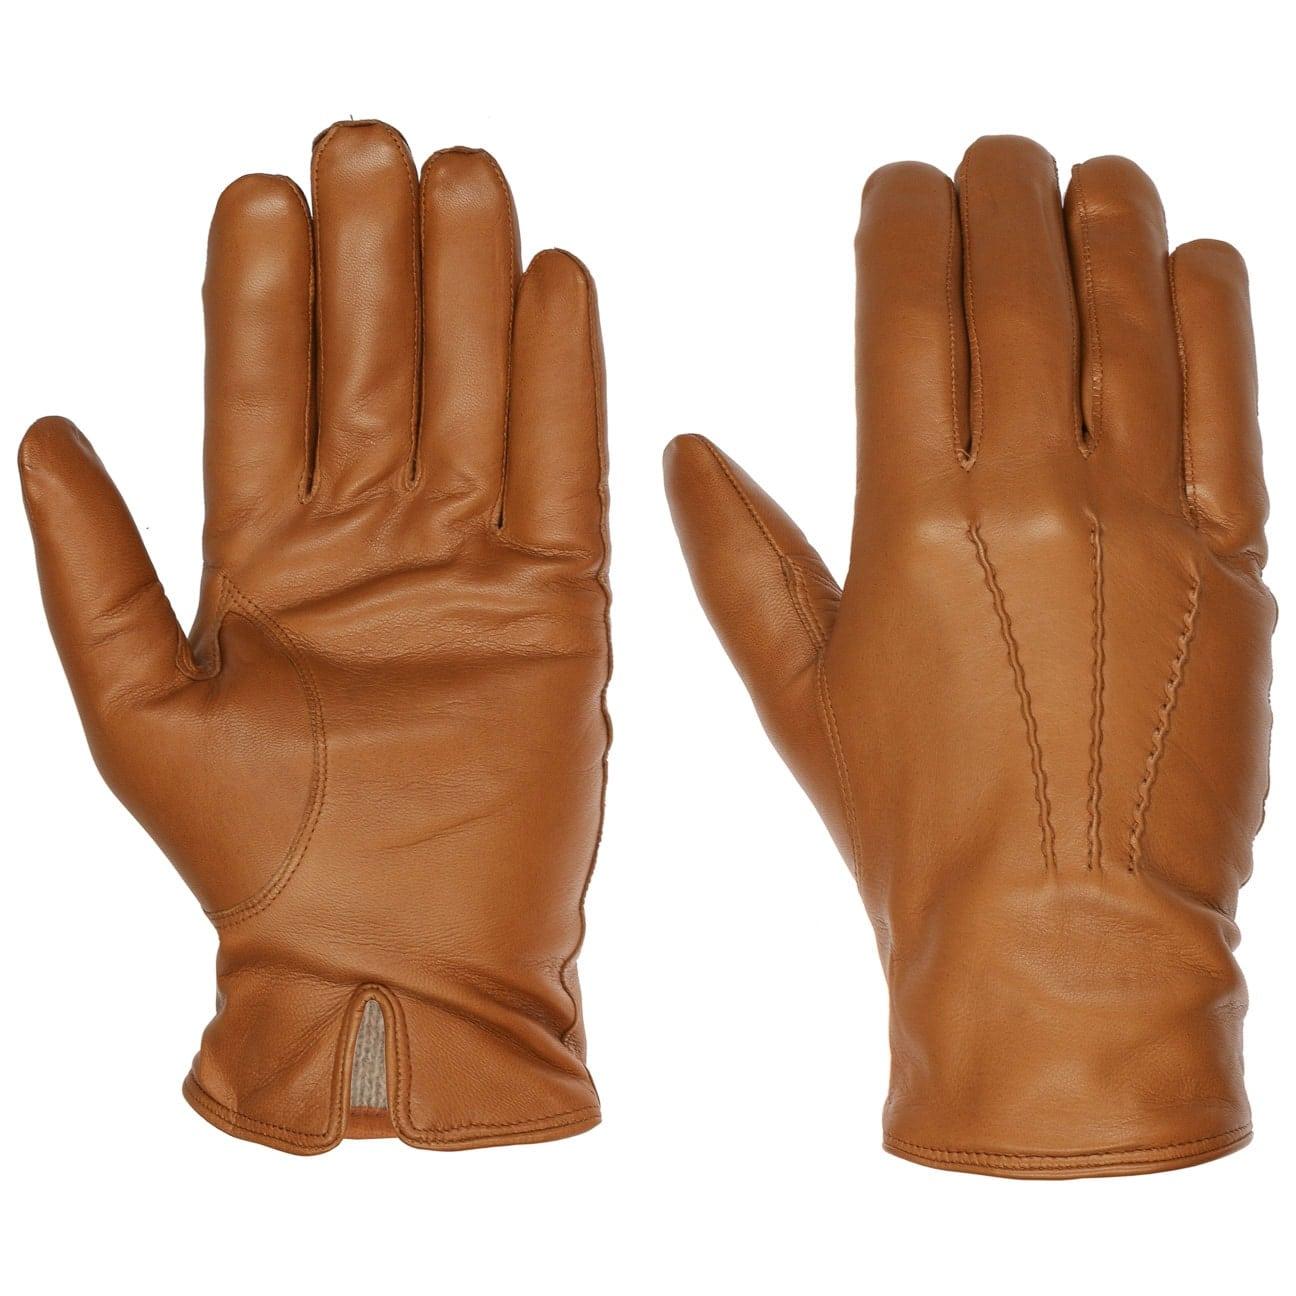 Gants pour Homme en Cuir Nappa by Caridei  gants en cuir